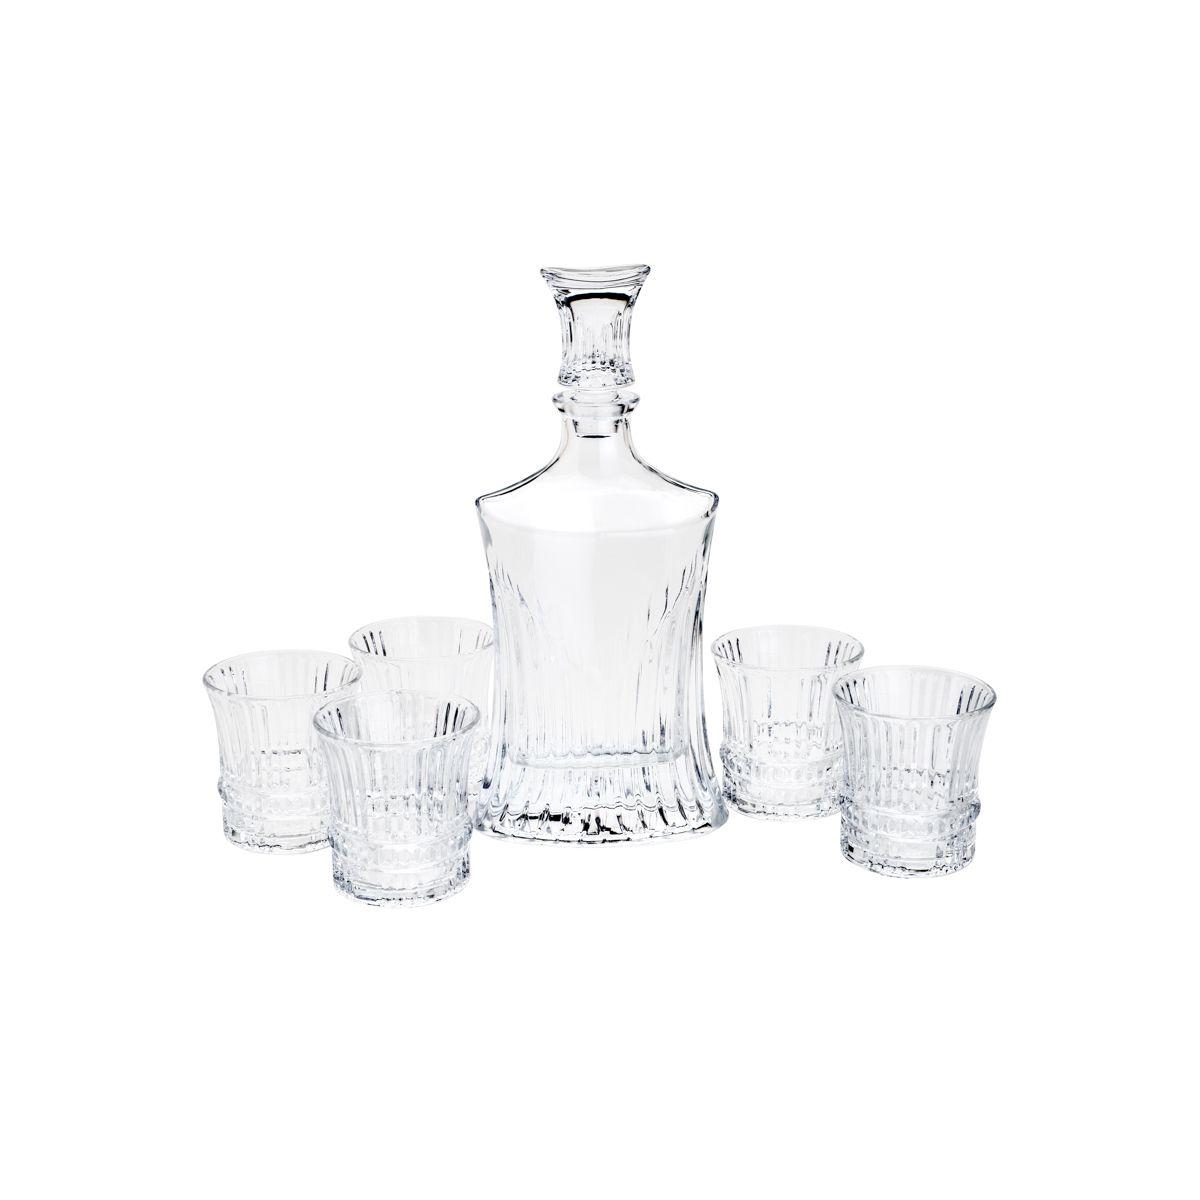 Conjunto Garrafa e Copos de Whisky Wolff  26643 - 7 Peças